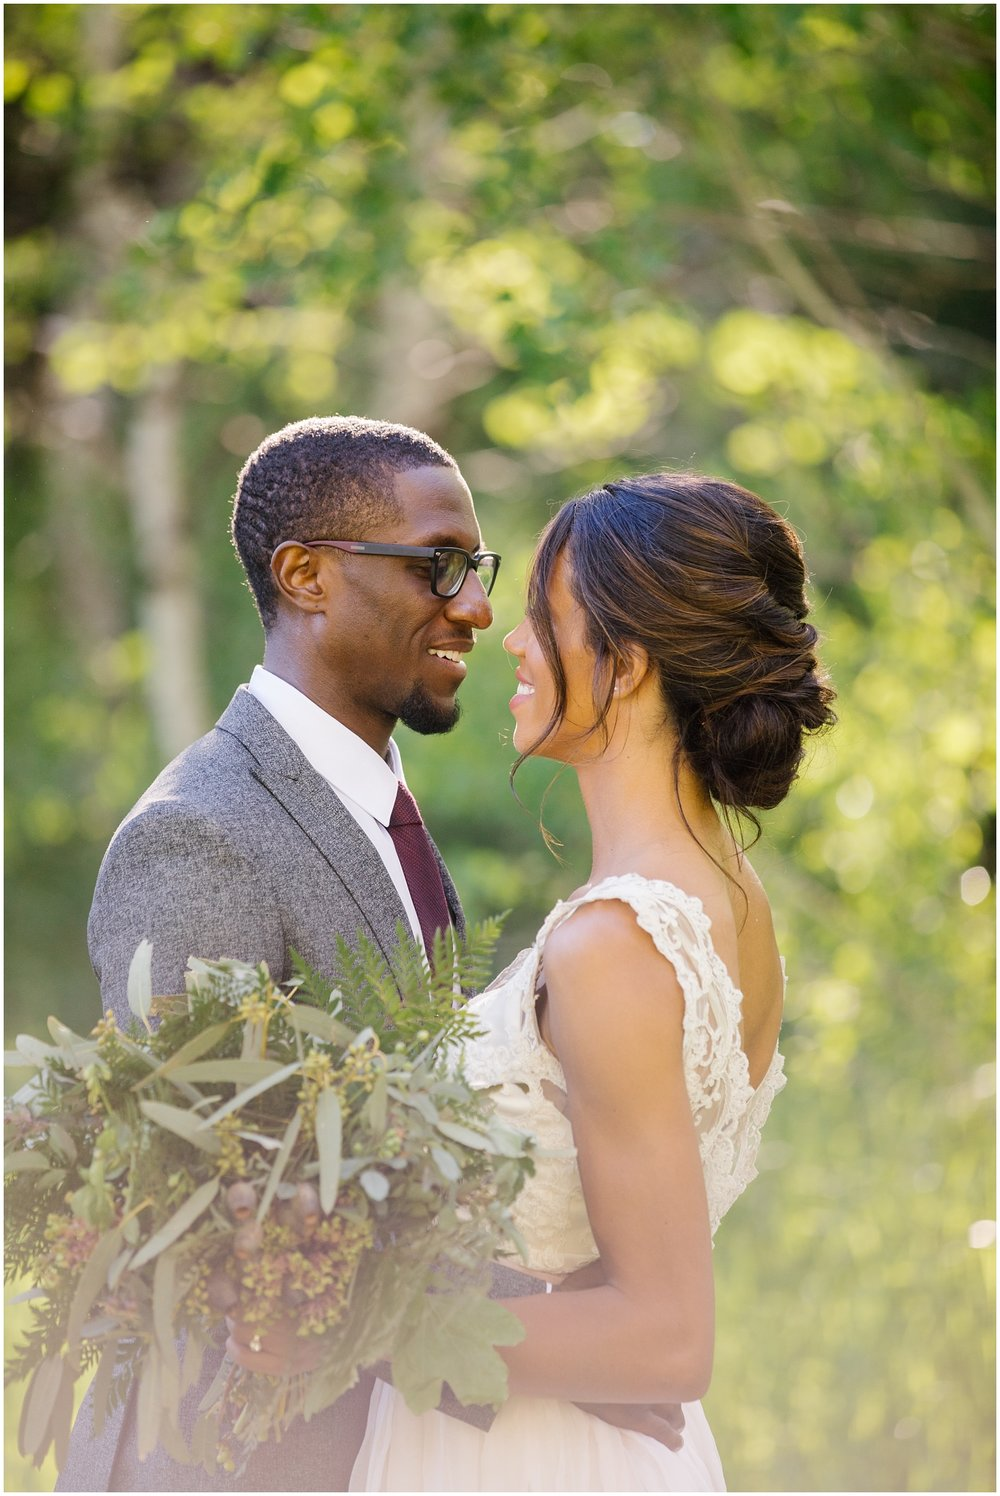 TreeHorseShoot-15_Lizzie-B-Imagery-Utah-Wedding-Photographer-Salt-Lake-City-Park-City-Oakley.jpg